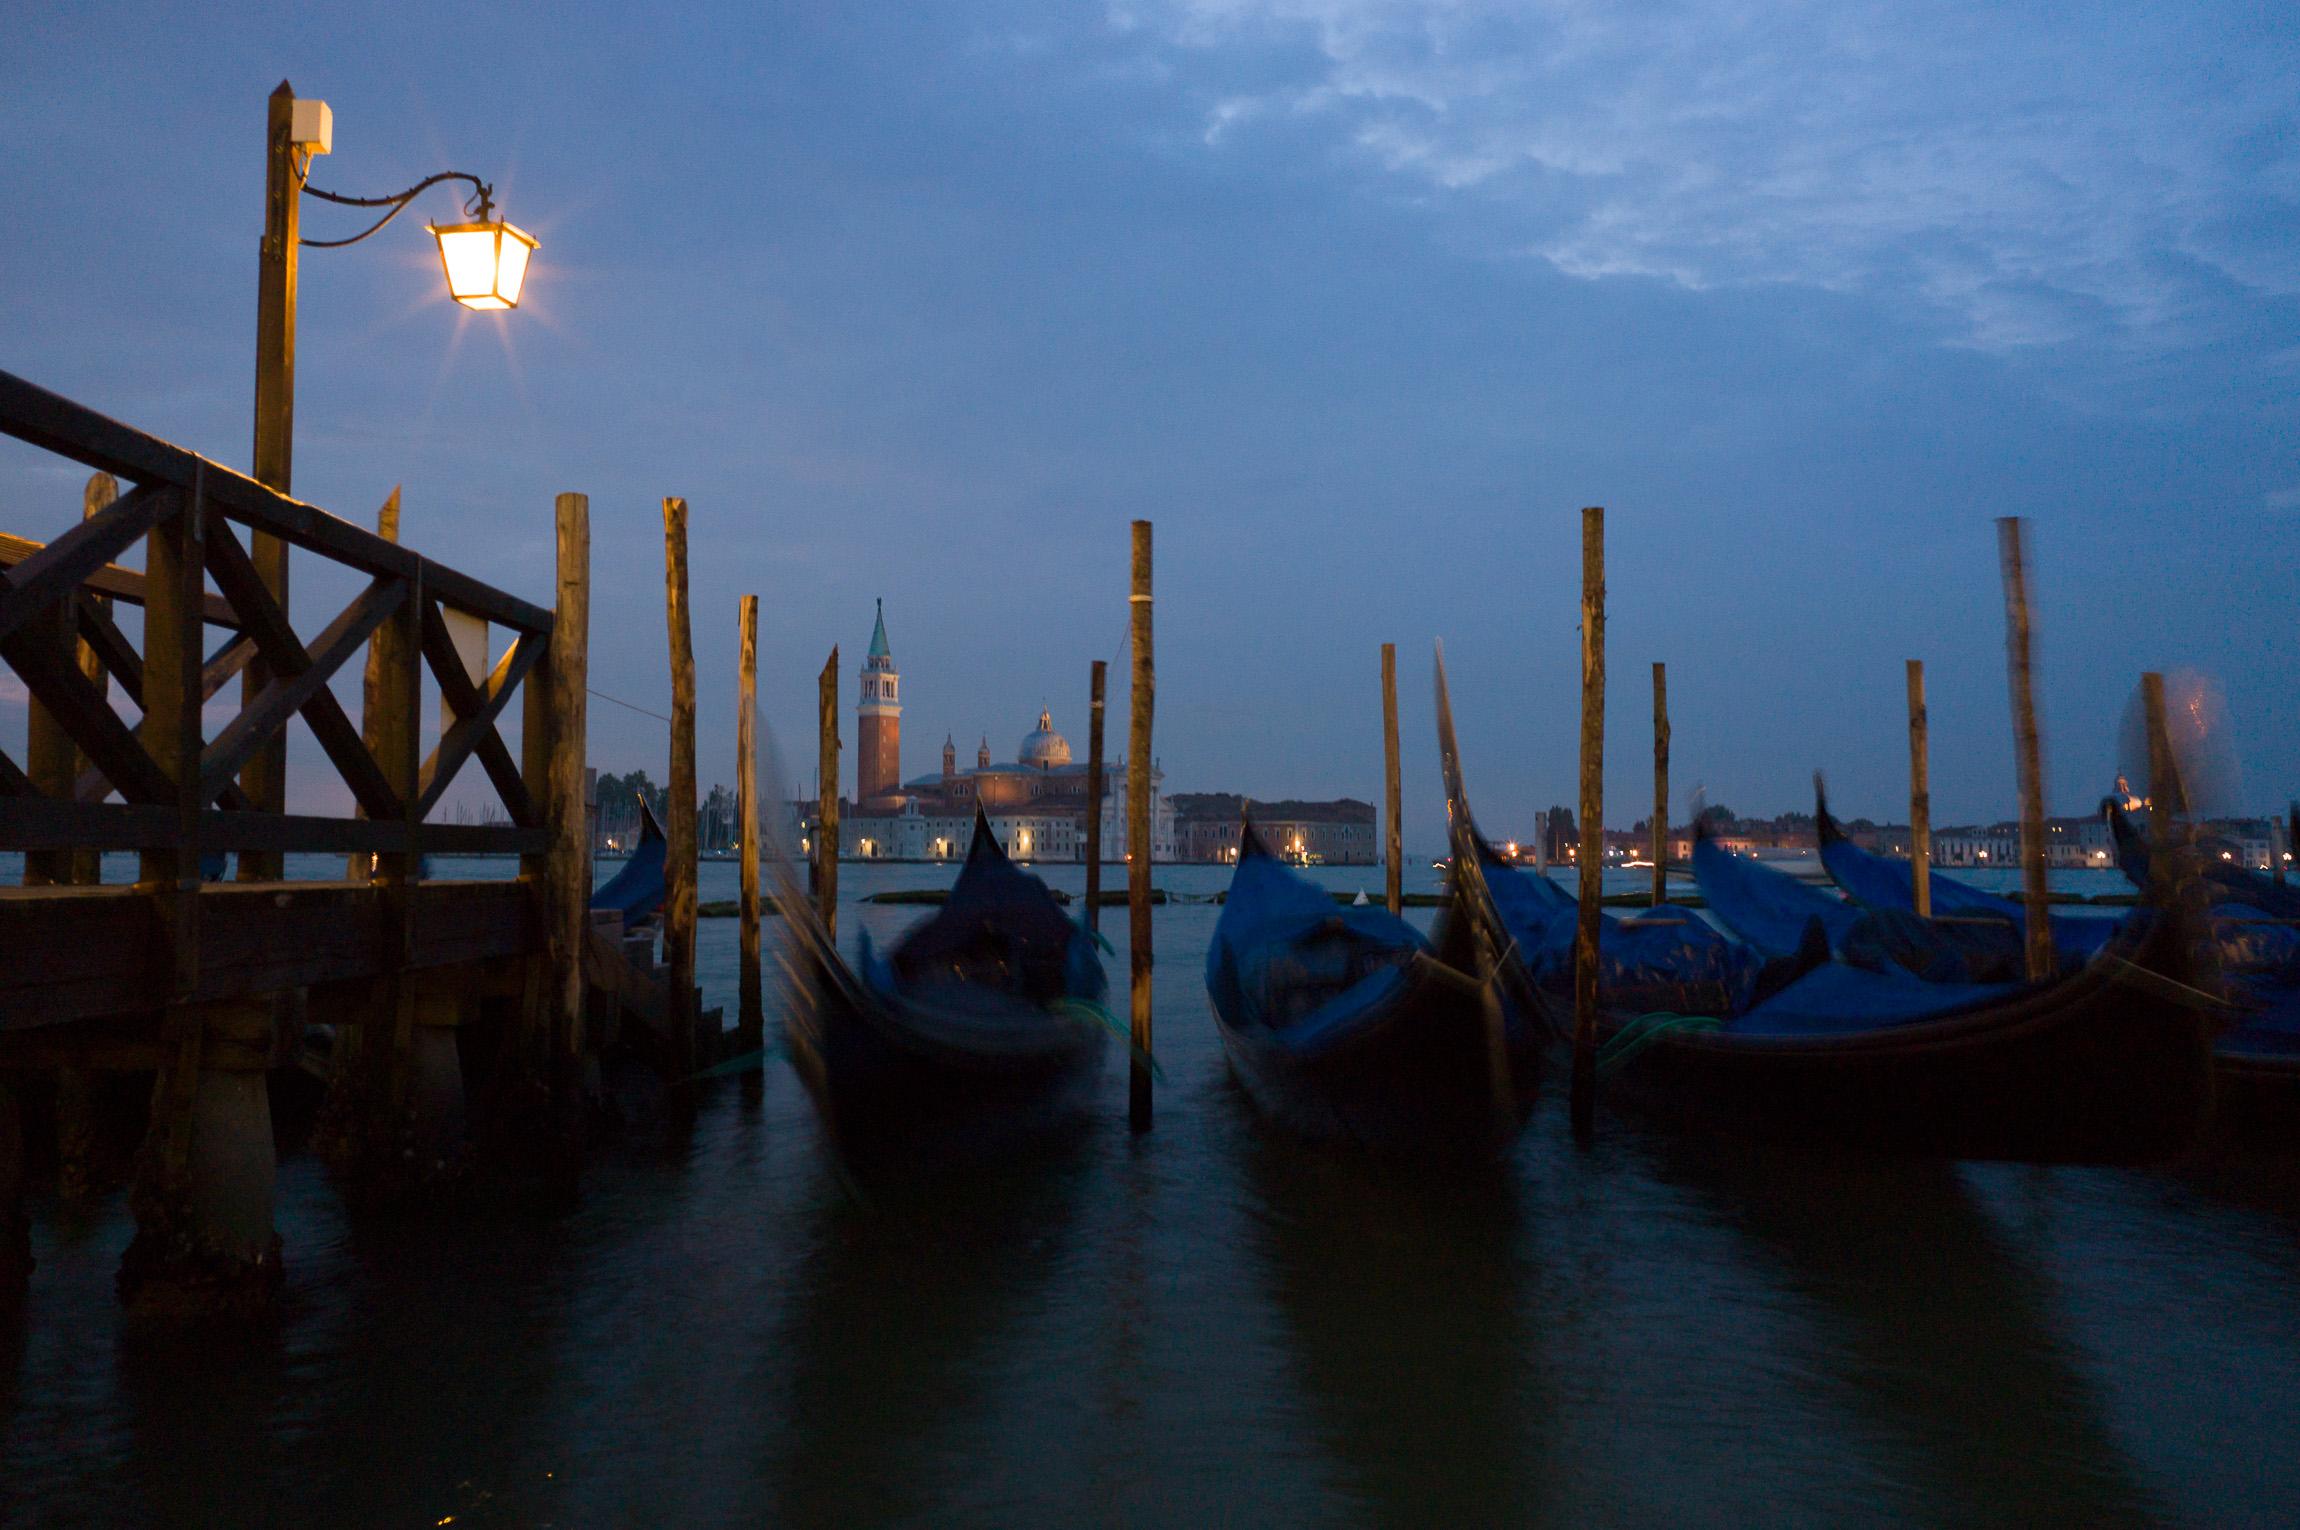 Stand-by Gondola, Venice, Italy